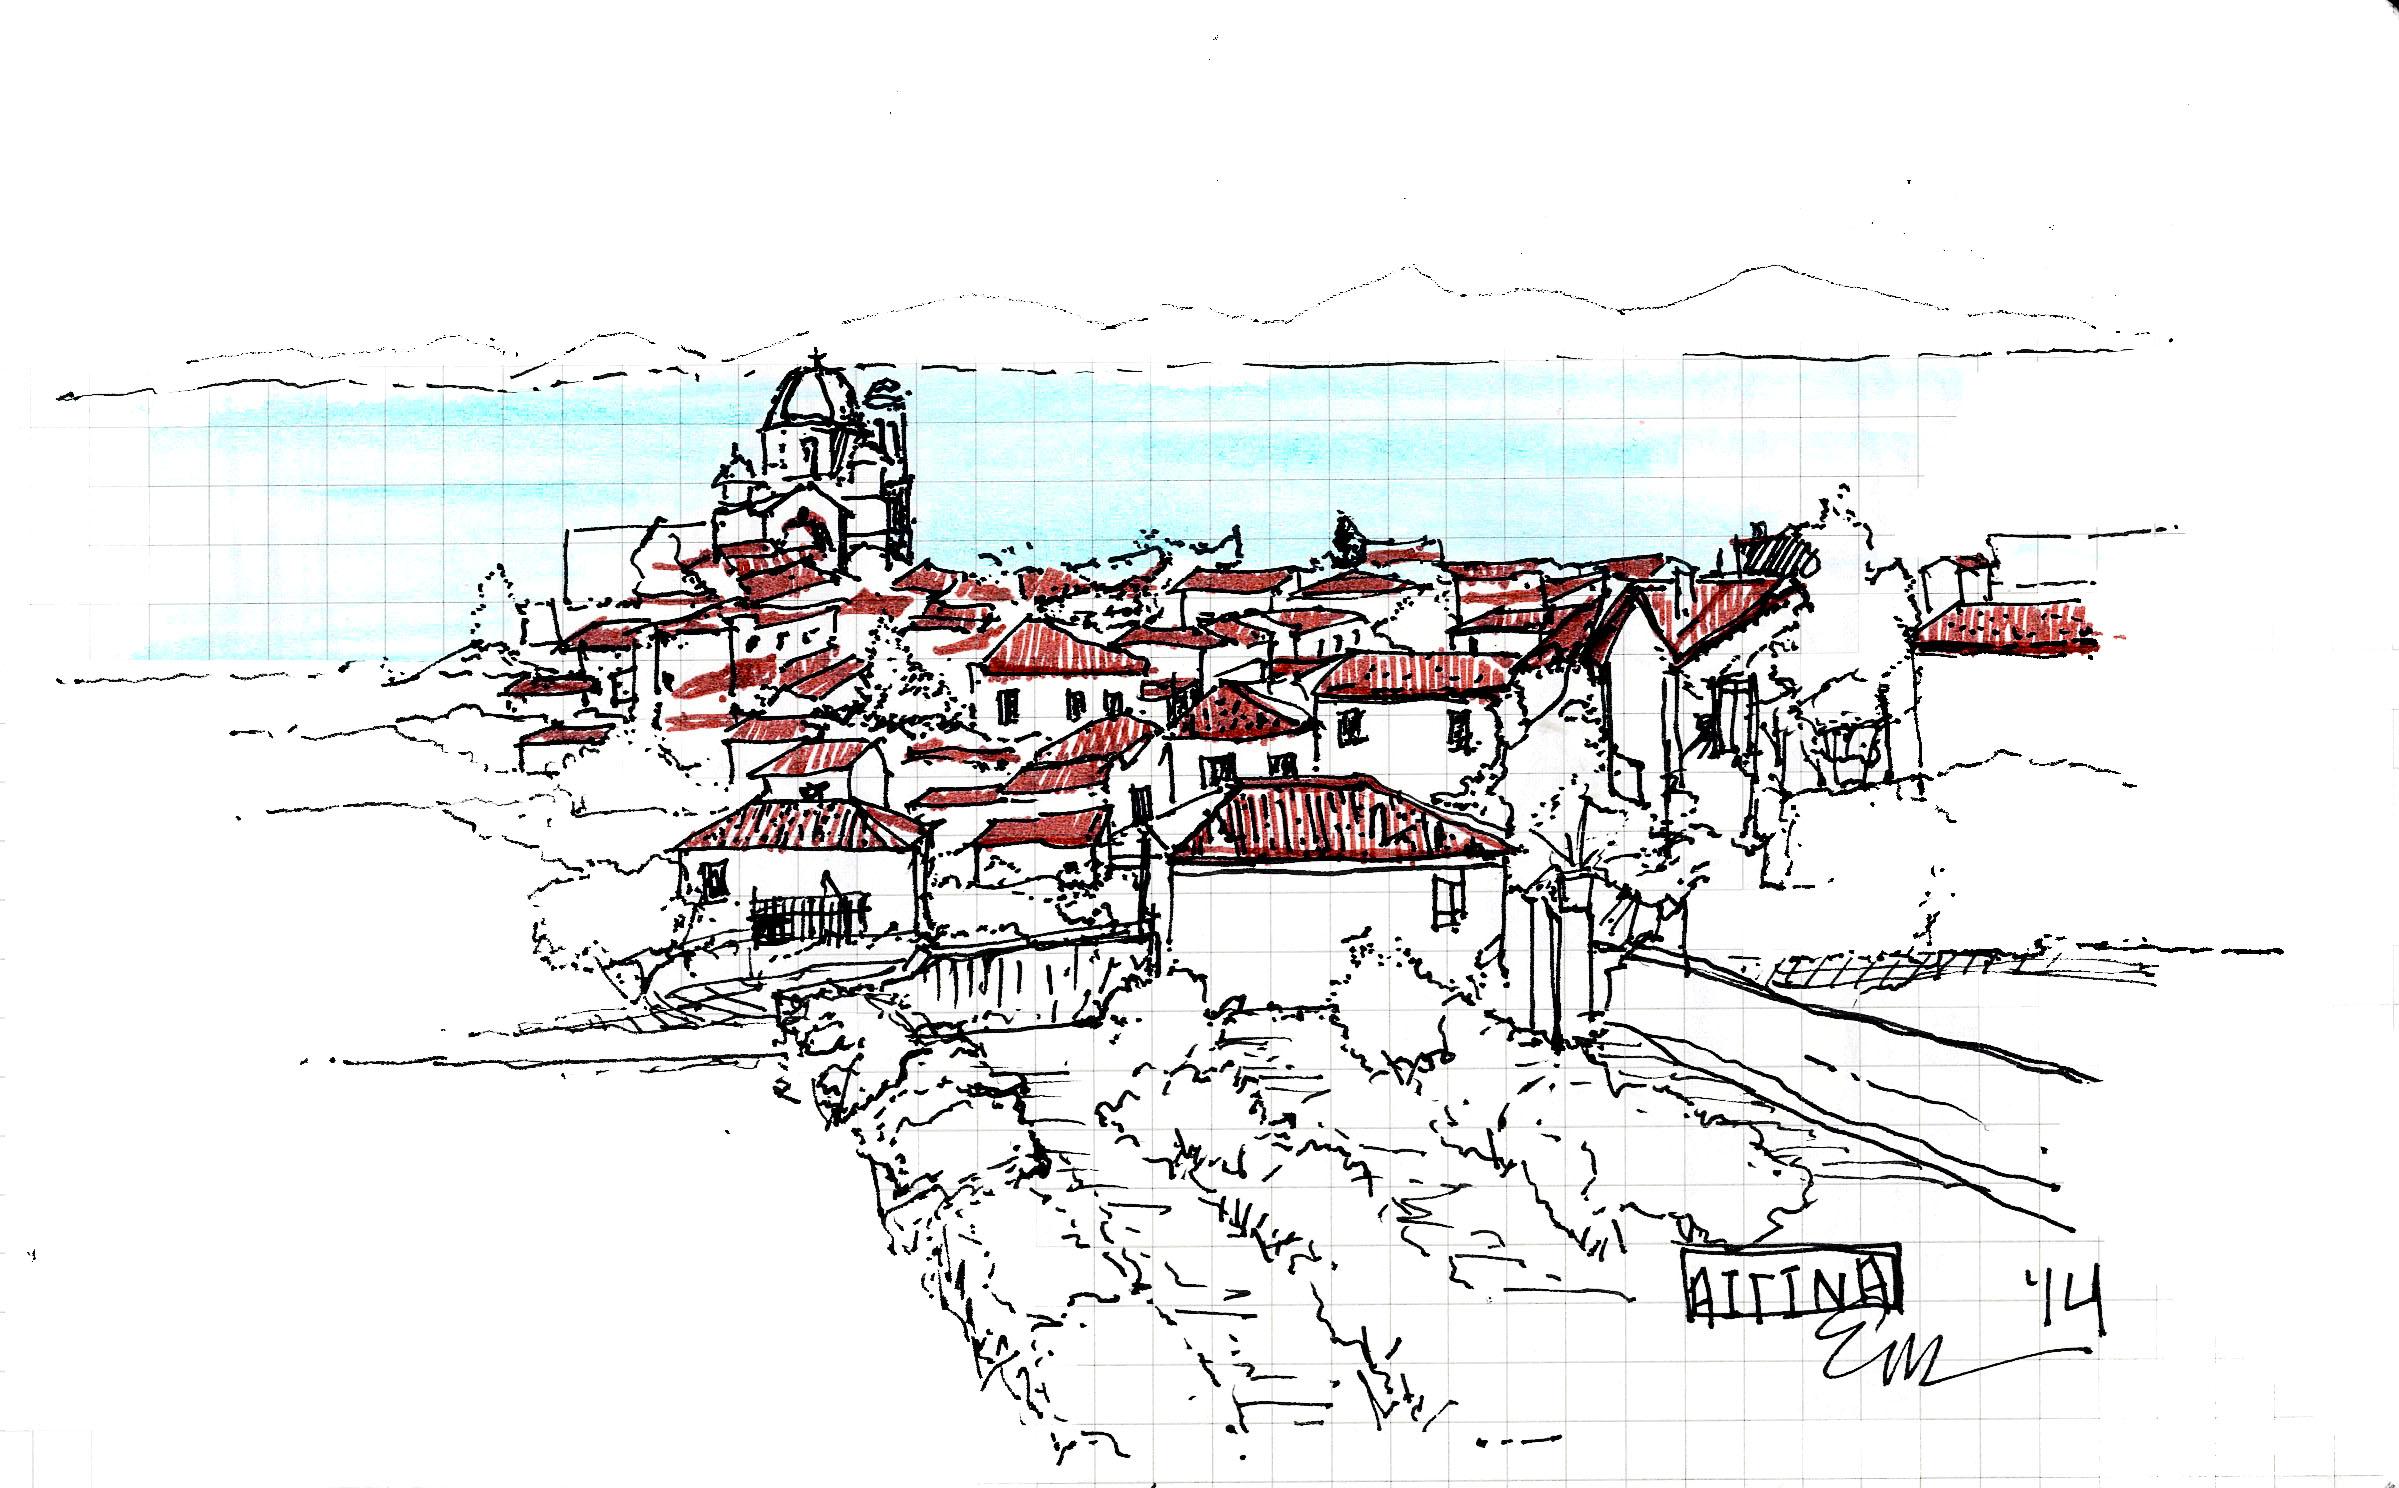 AegenaSketch.jpg